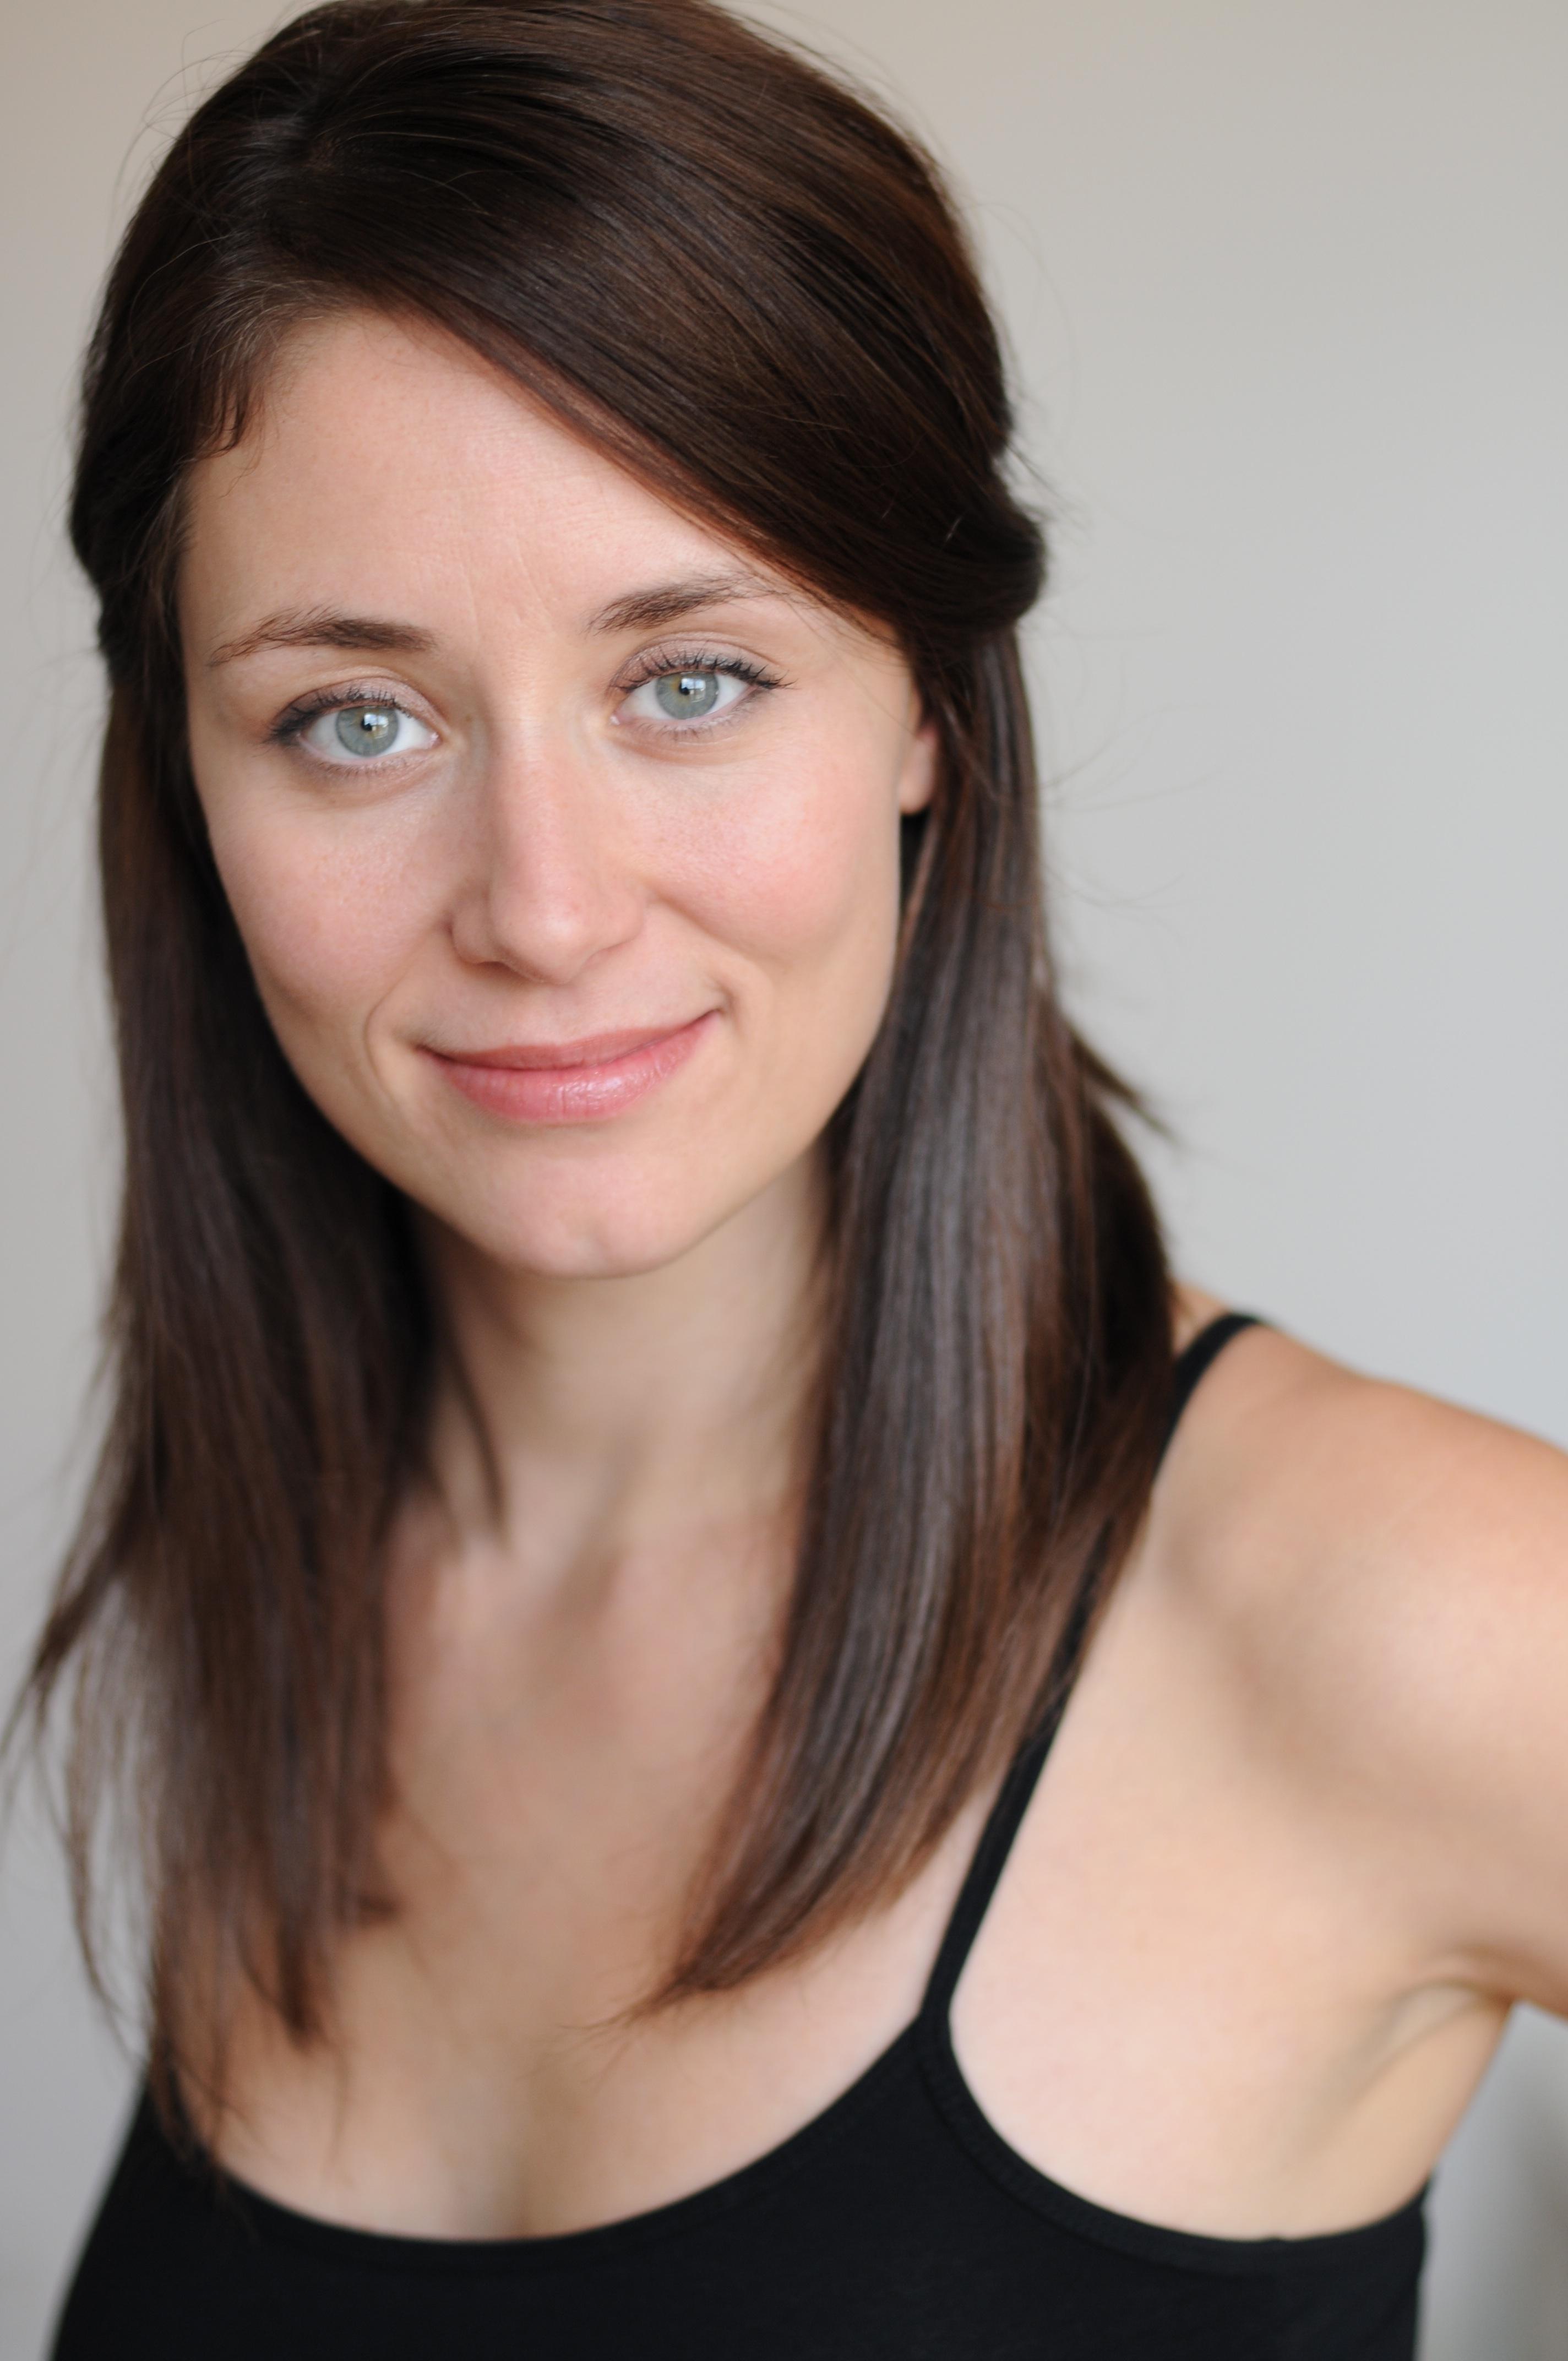 Nicole Burdette Net Worth